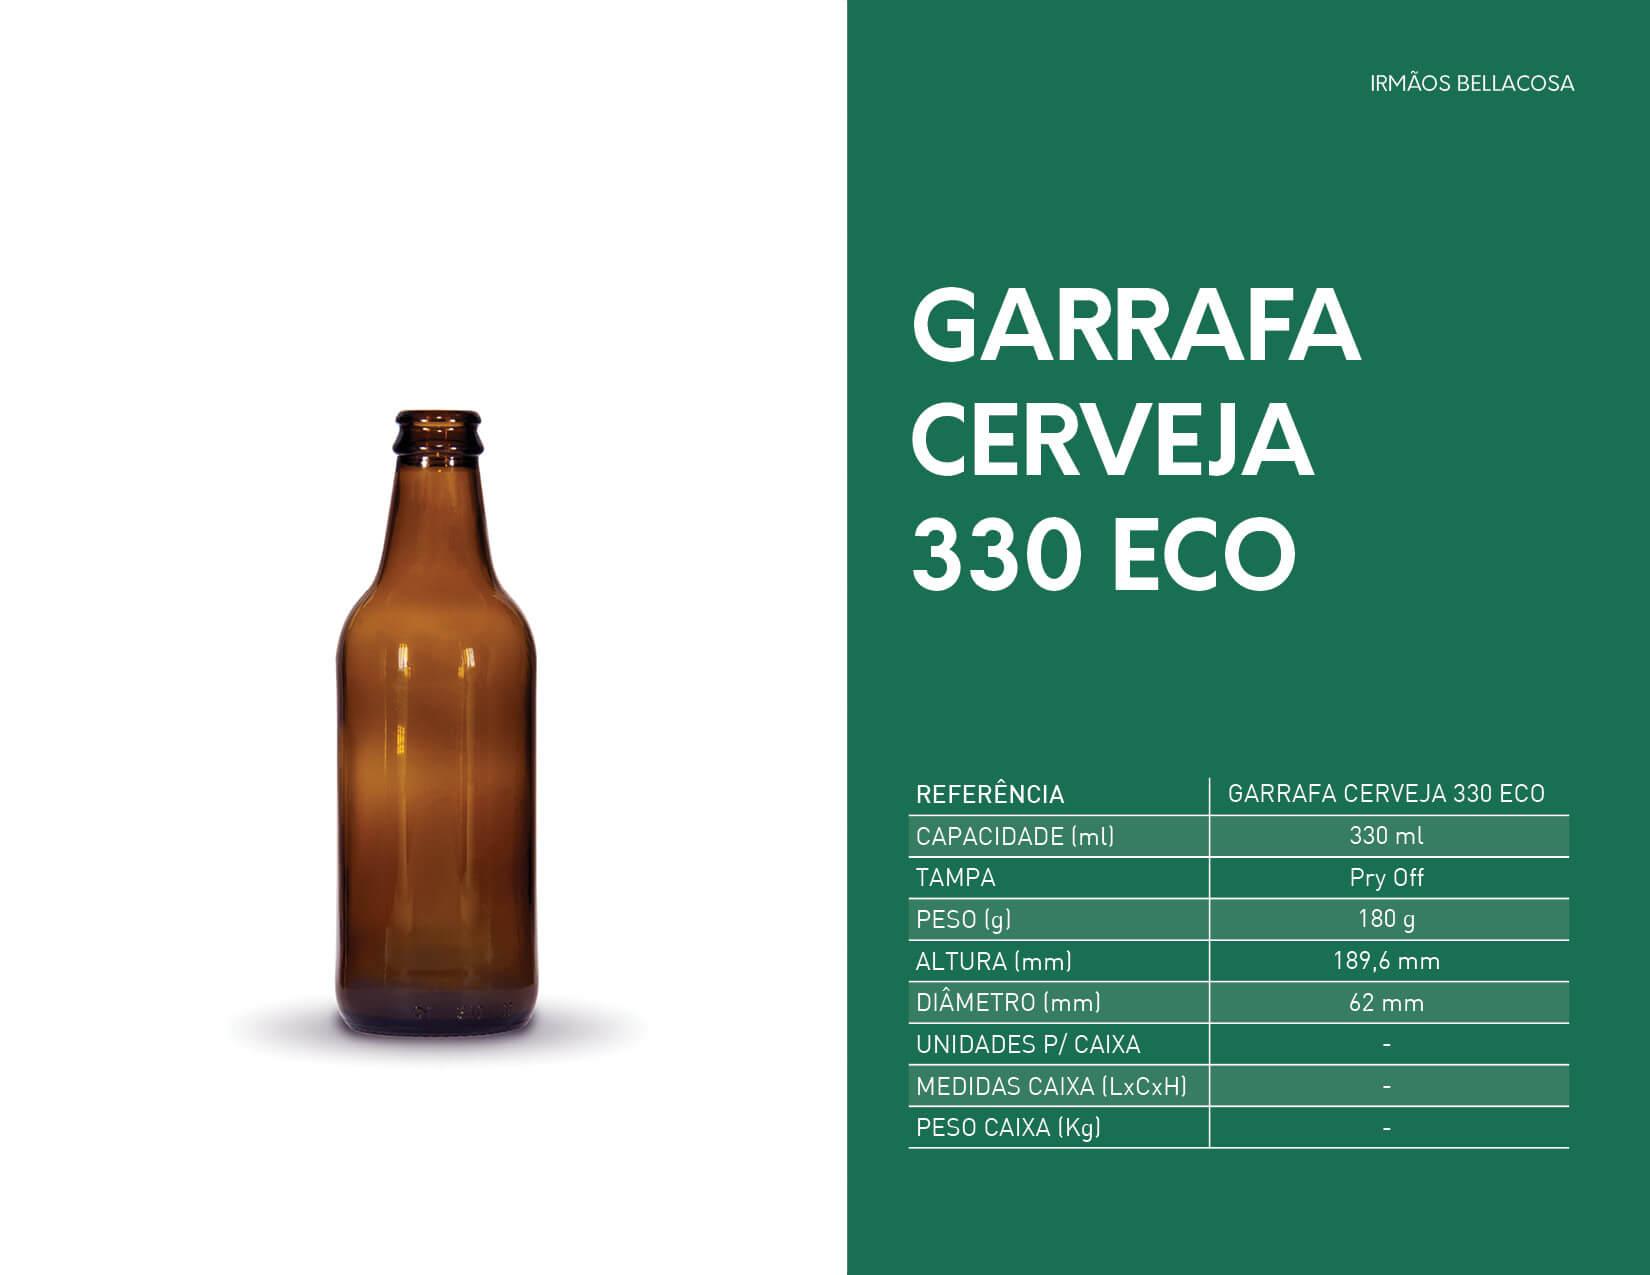 055-Garrafa-Cerveja-330-Eco-irmaos-bellacosa-embalagens-de-vidro